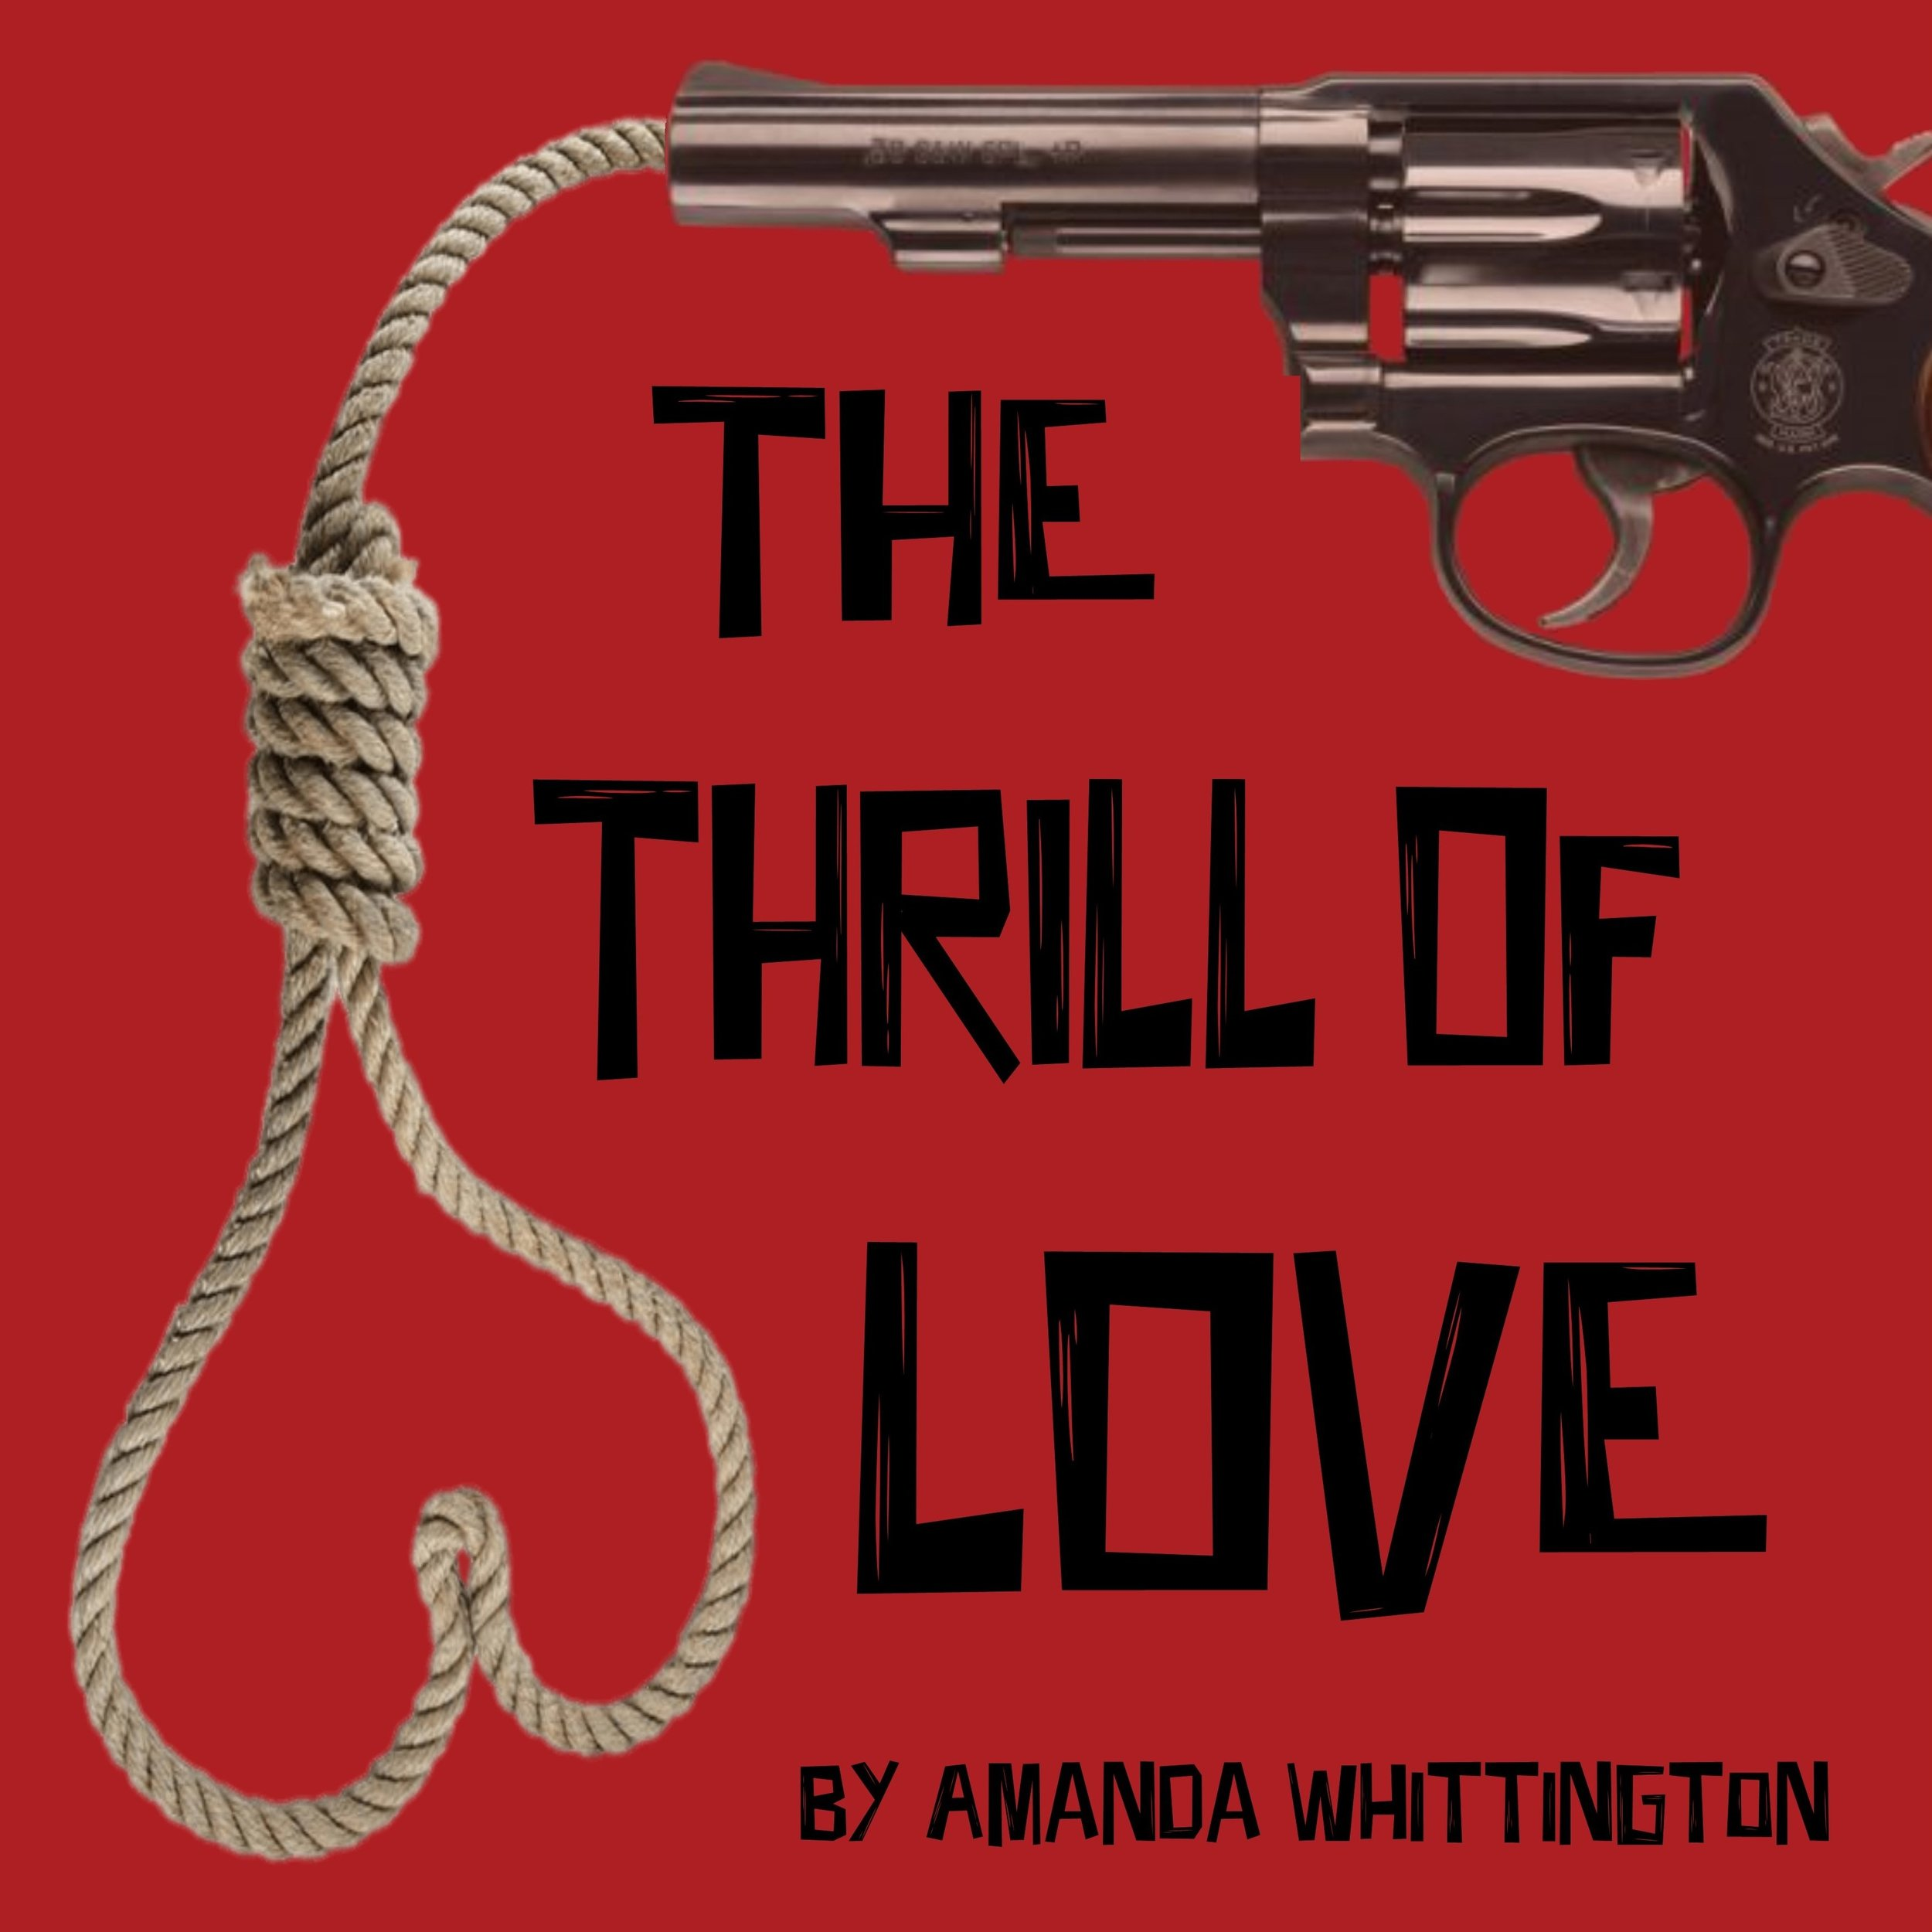 The Thrill of Love web image.jpg